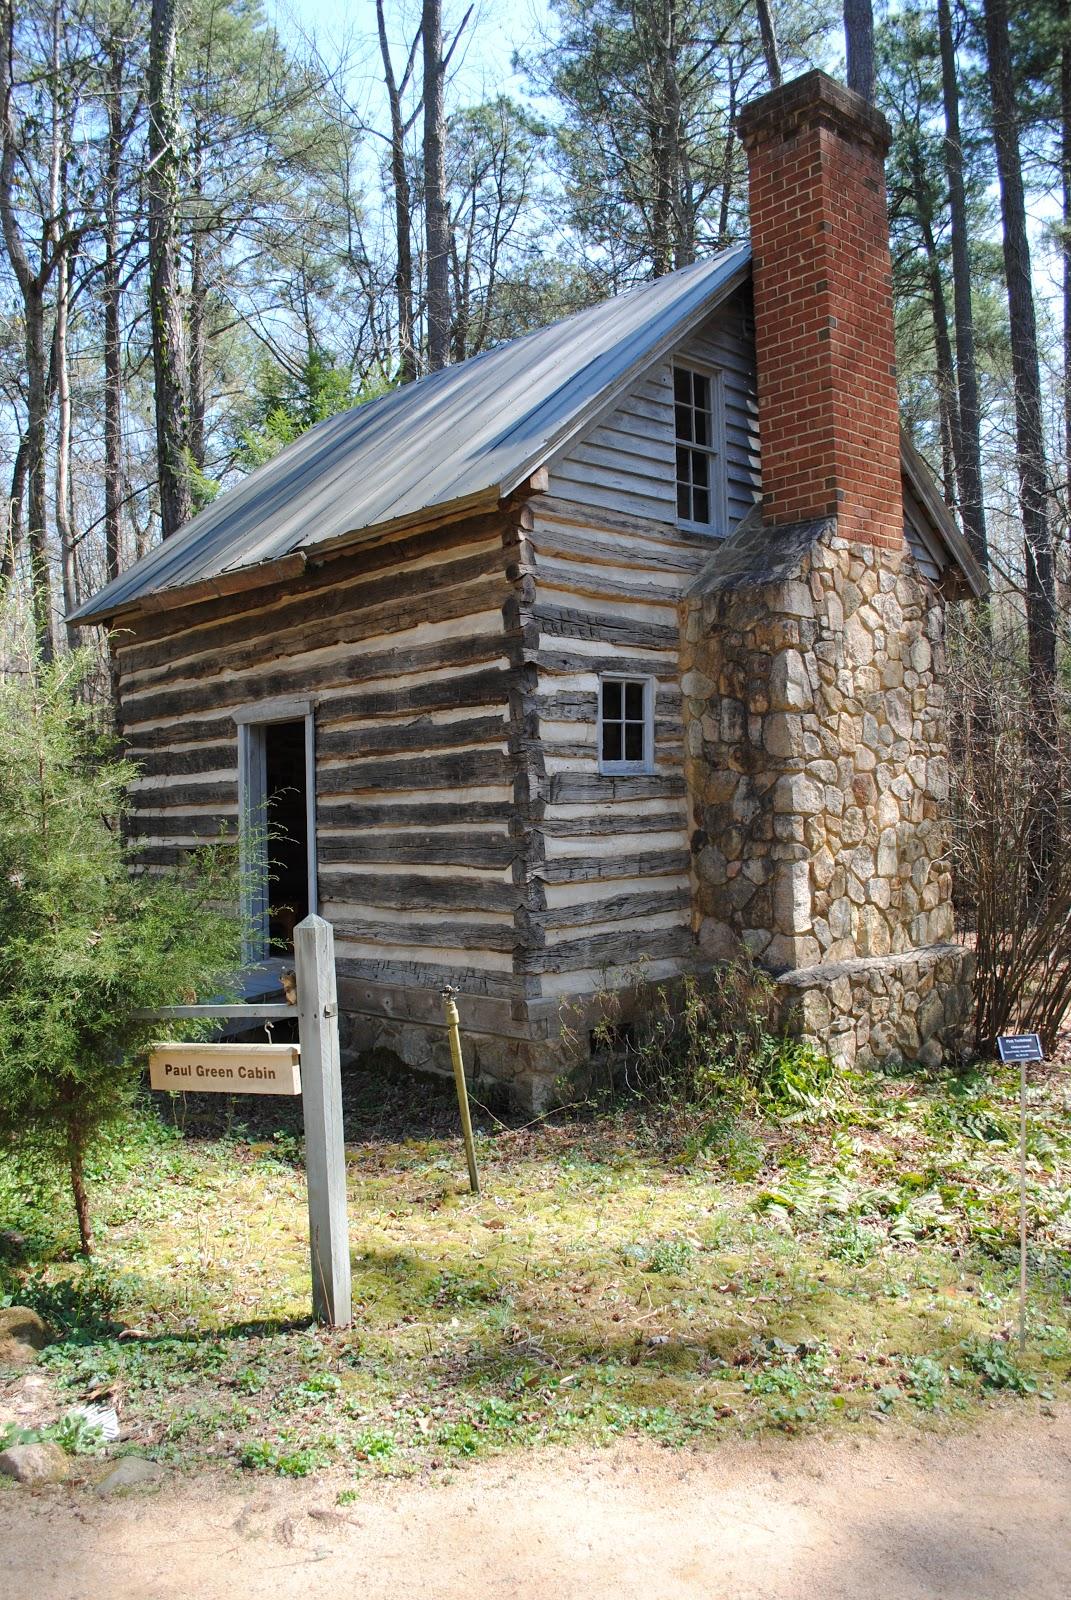 House With Chimney : The chimney betrays era handmade houses with noah